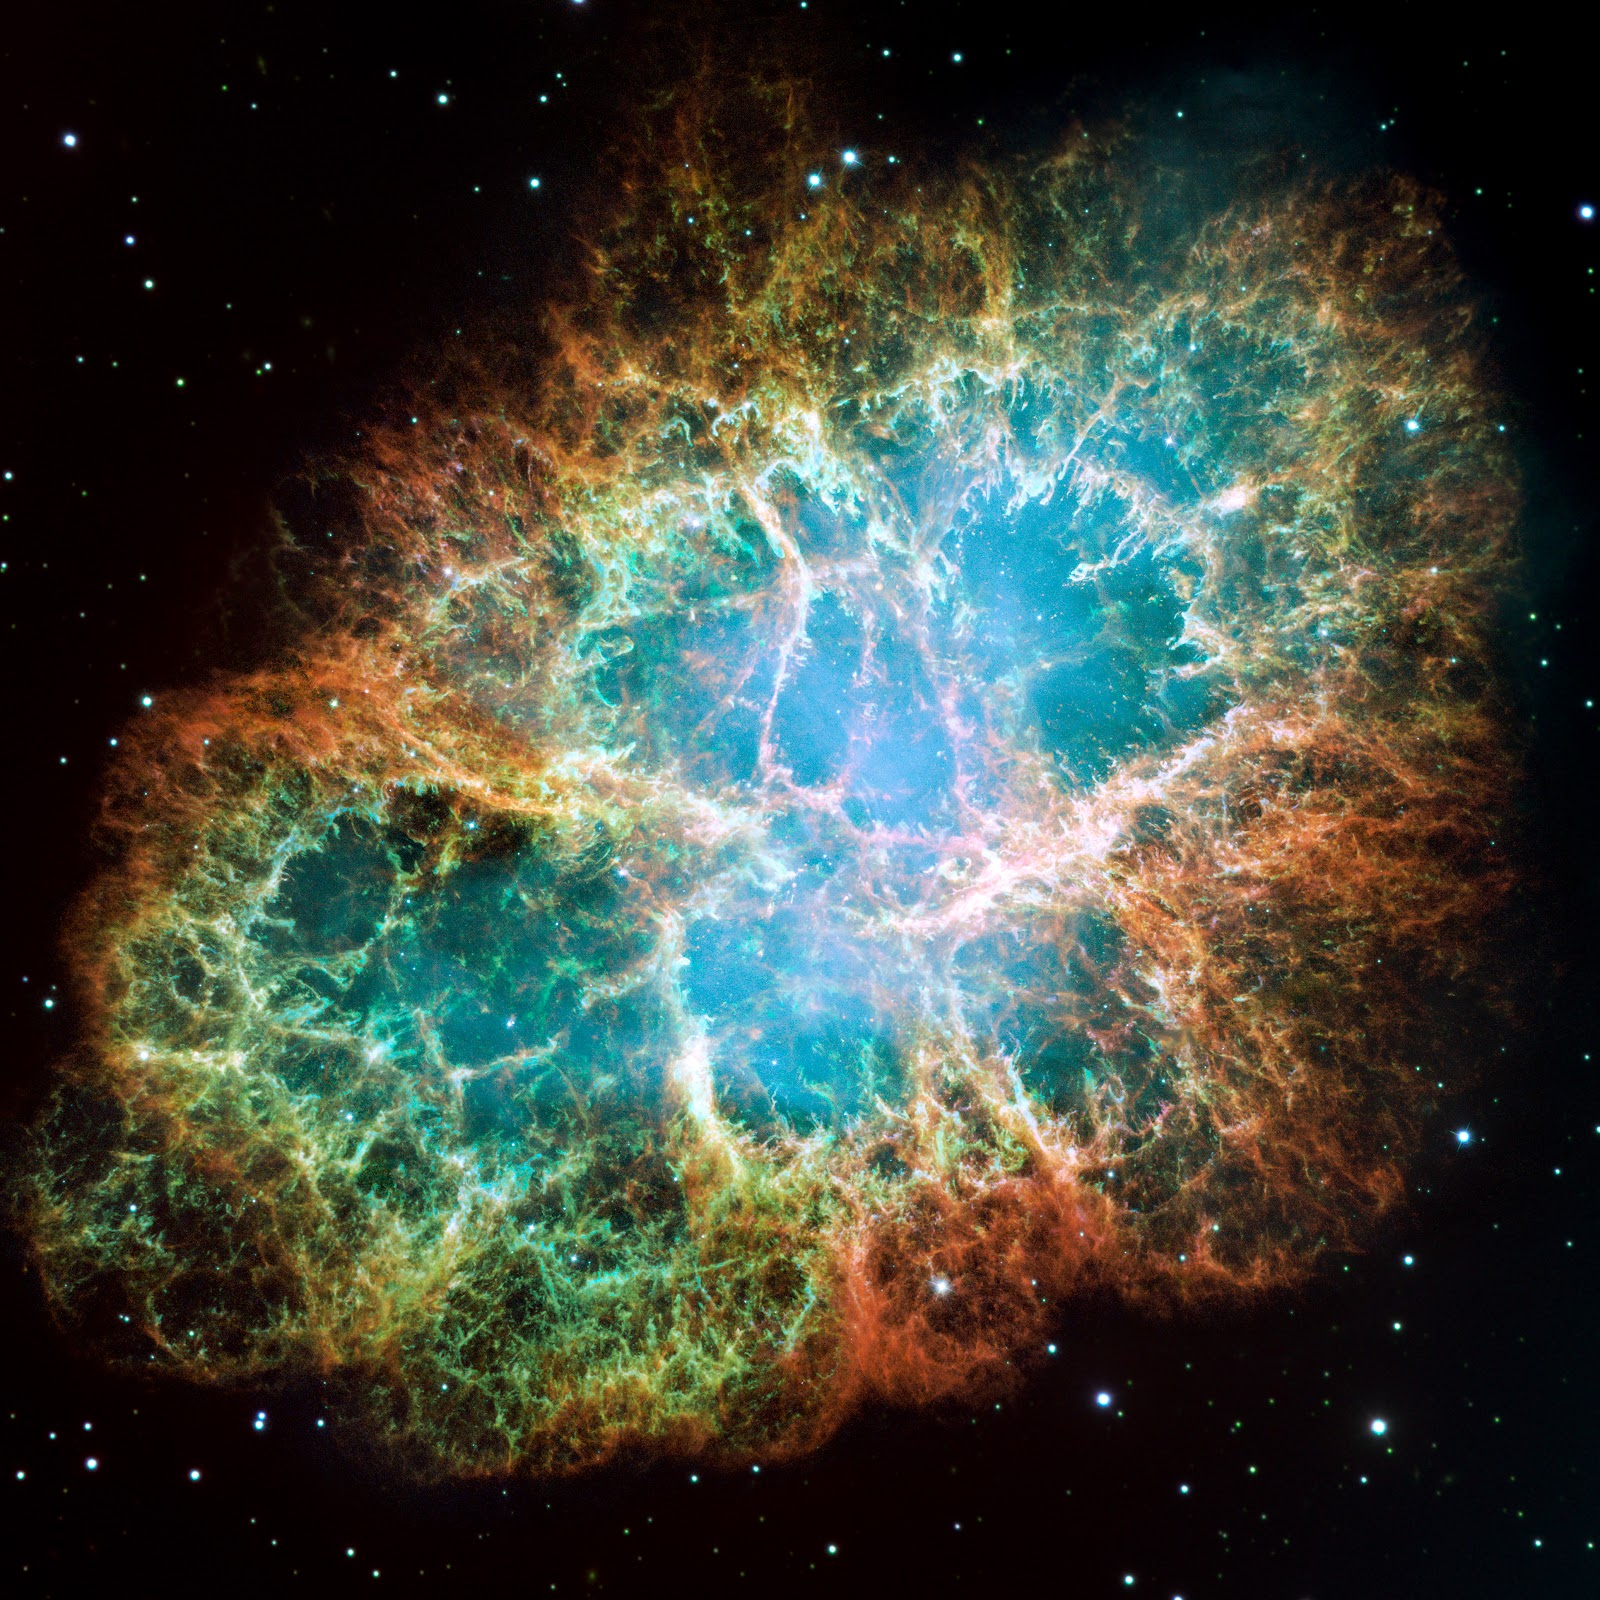 Crab nebula nasa goddard space flight center